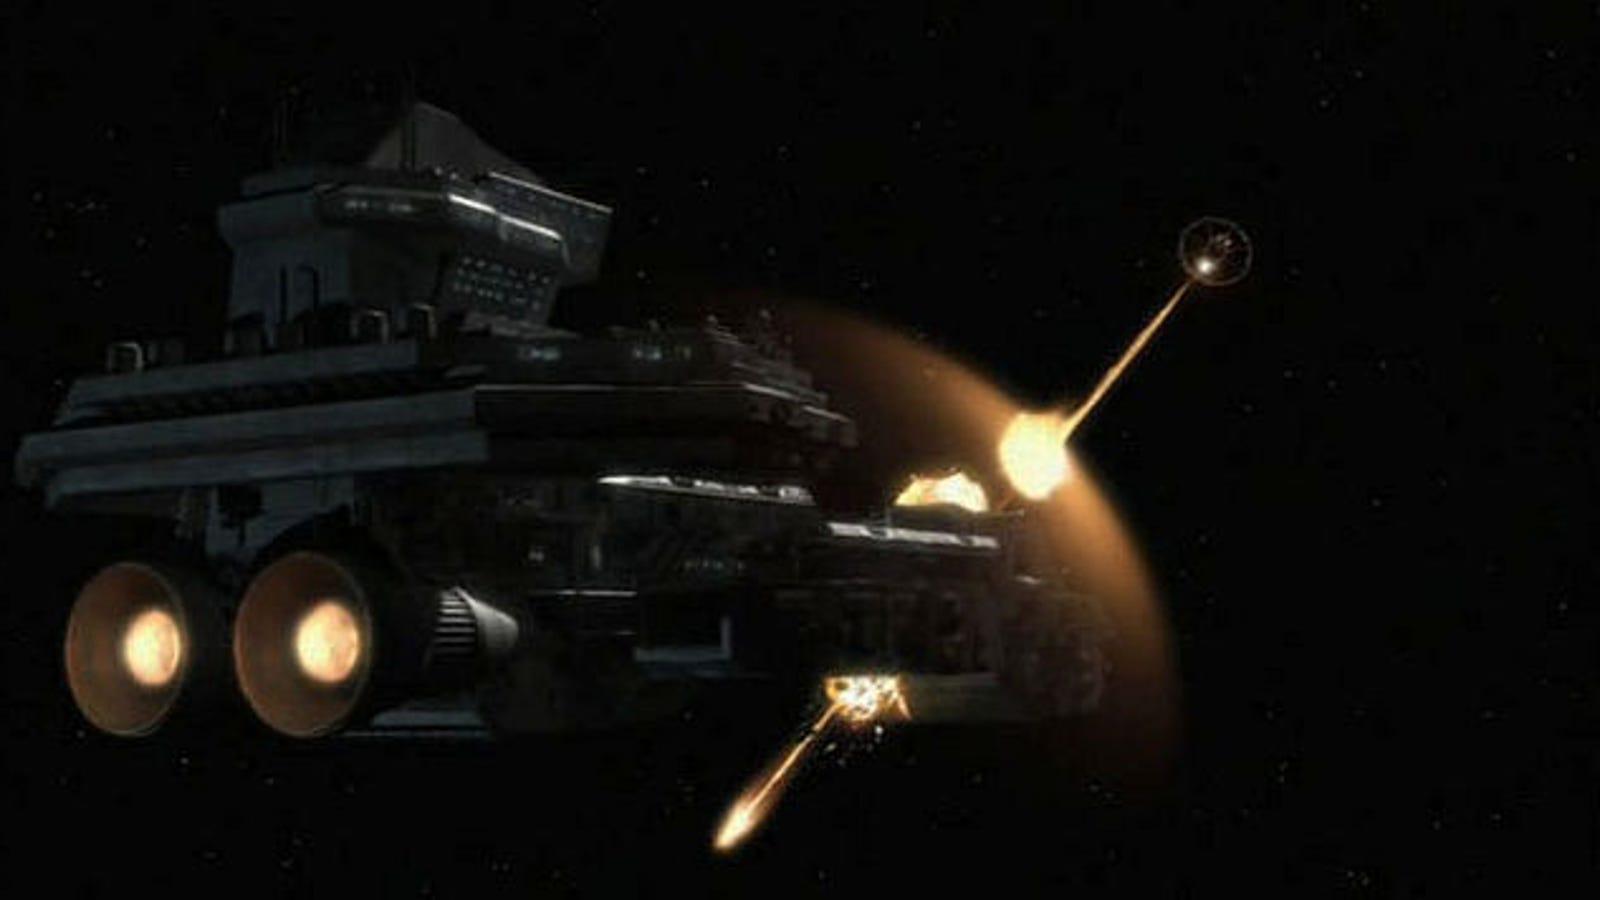 stargate sg-1 season 4 episode 16